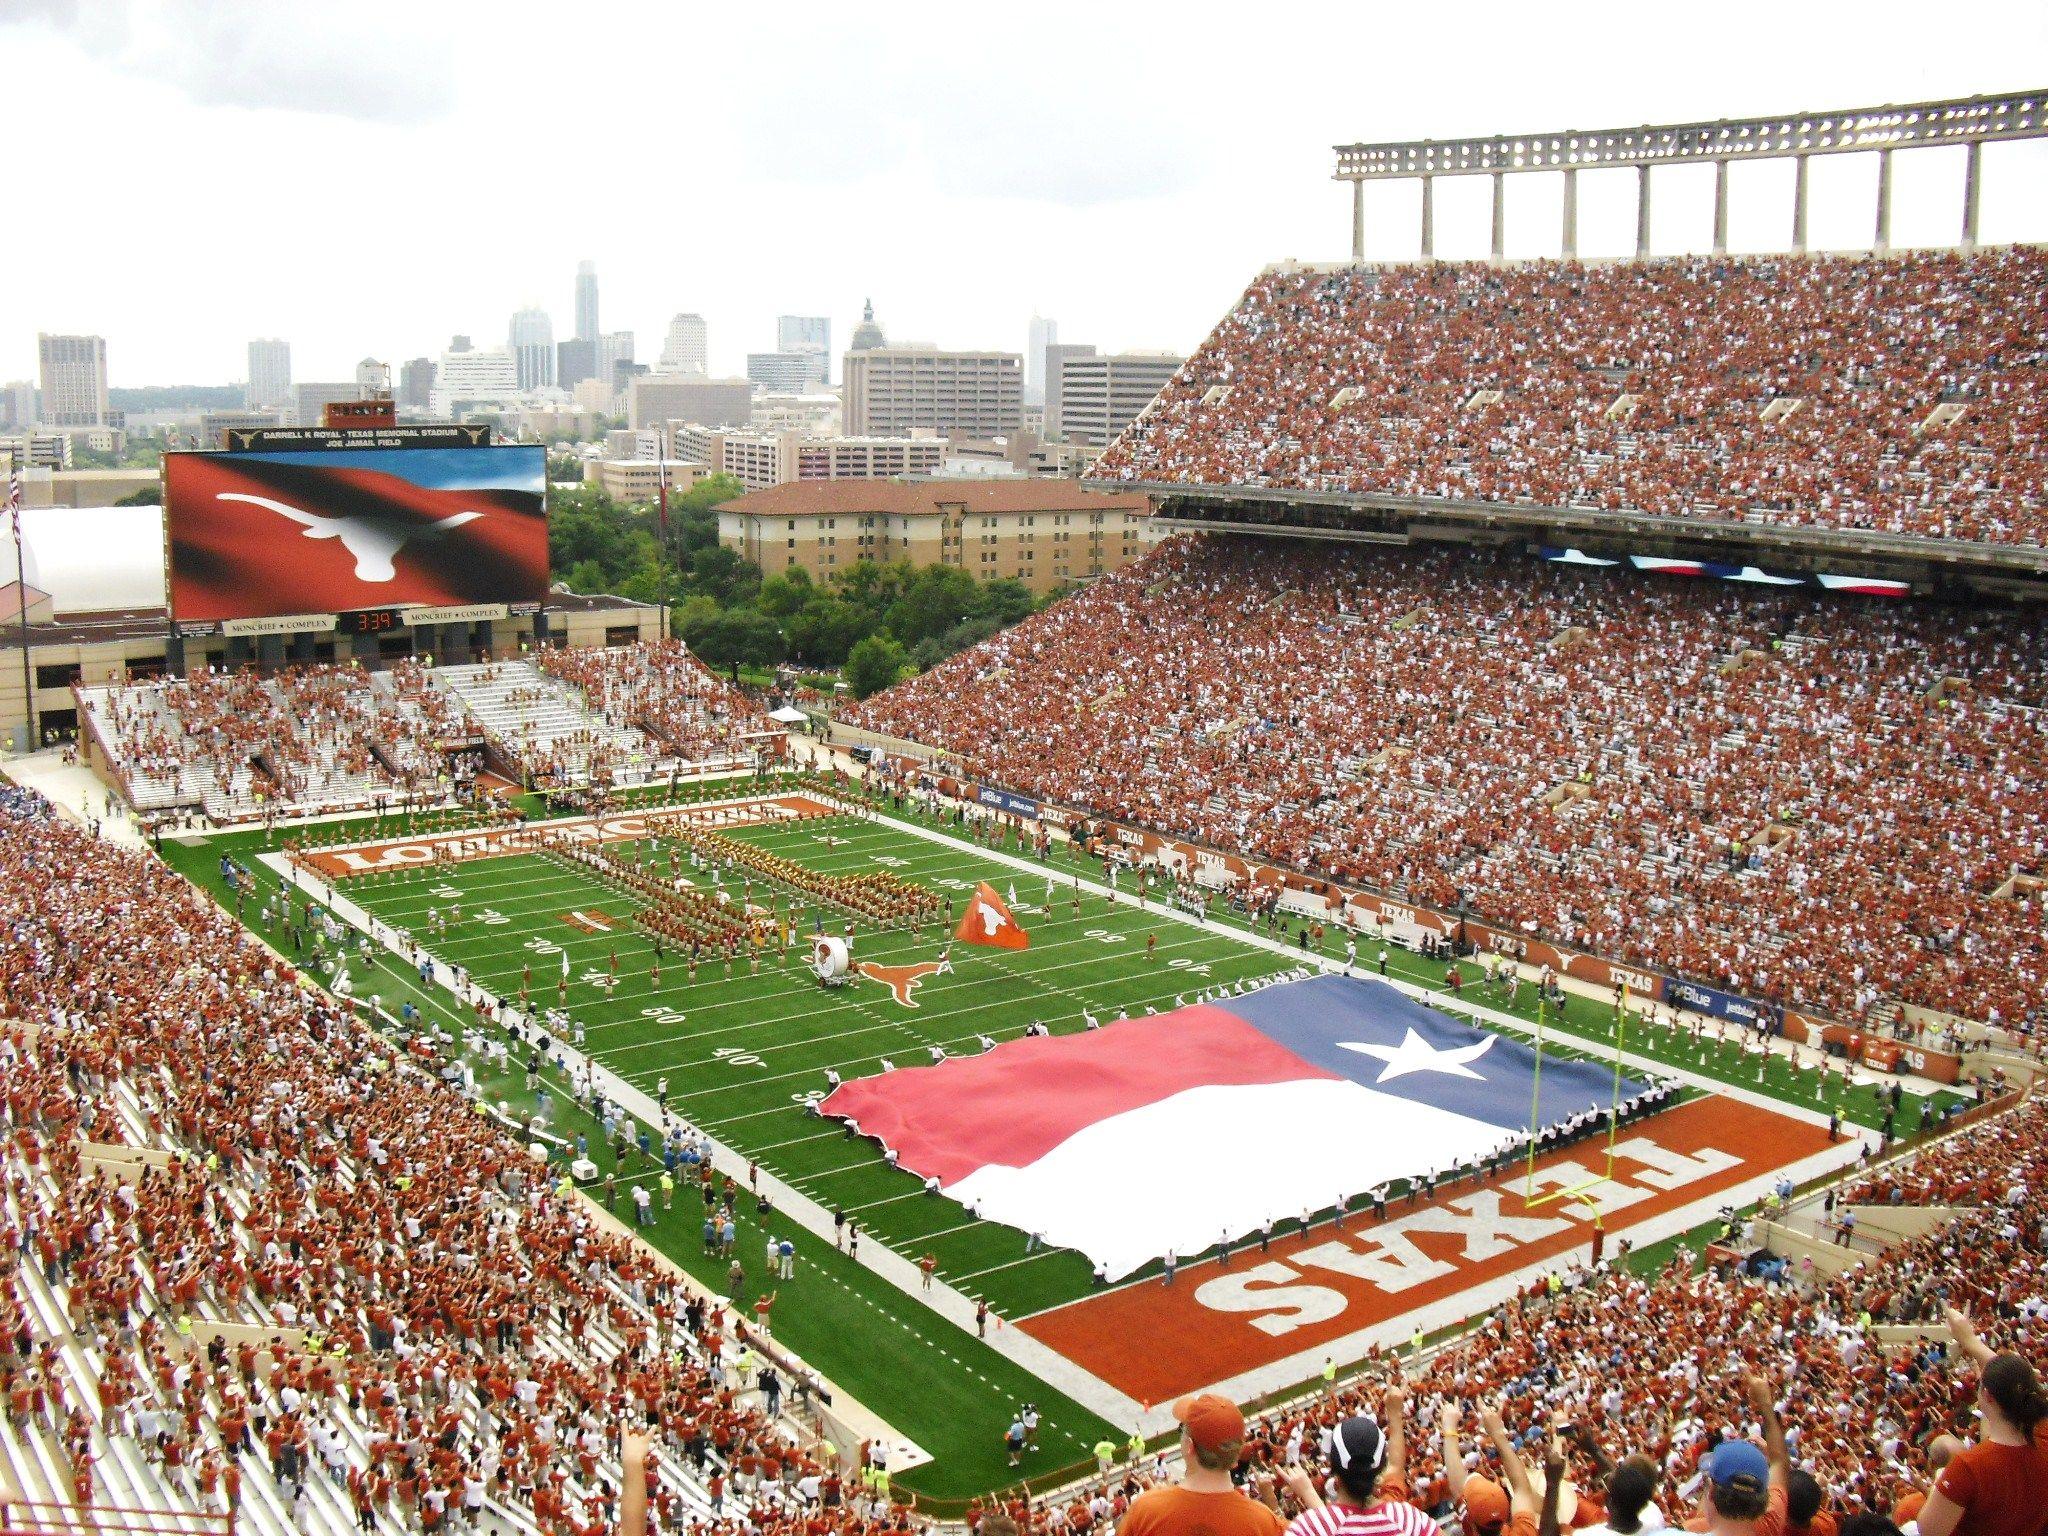 University Of Texas At Austin Longhorns A Division 1 Fbs Big 12